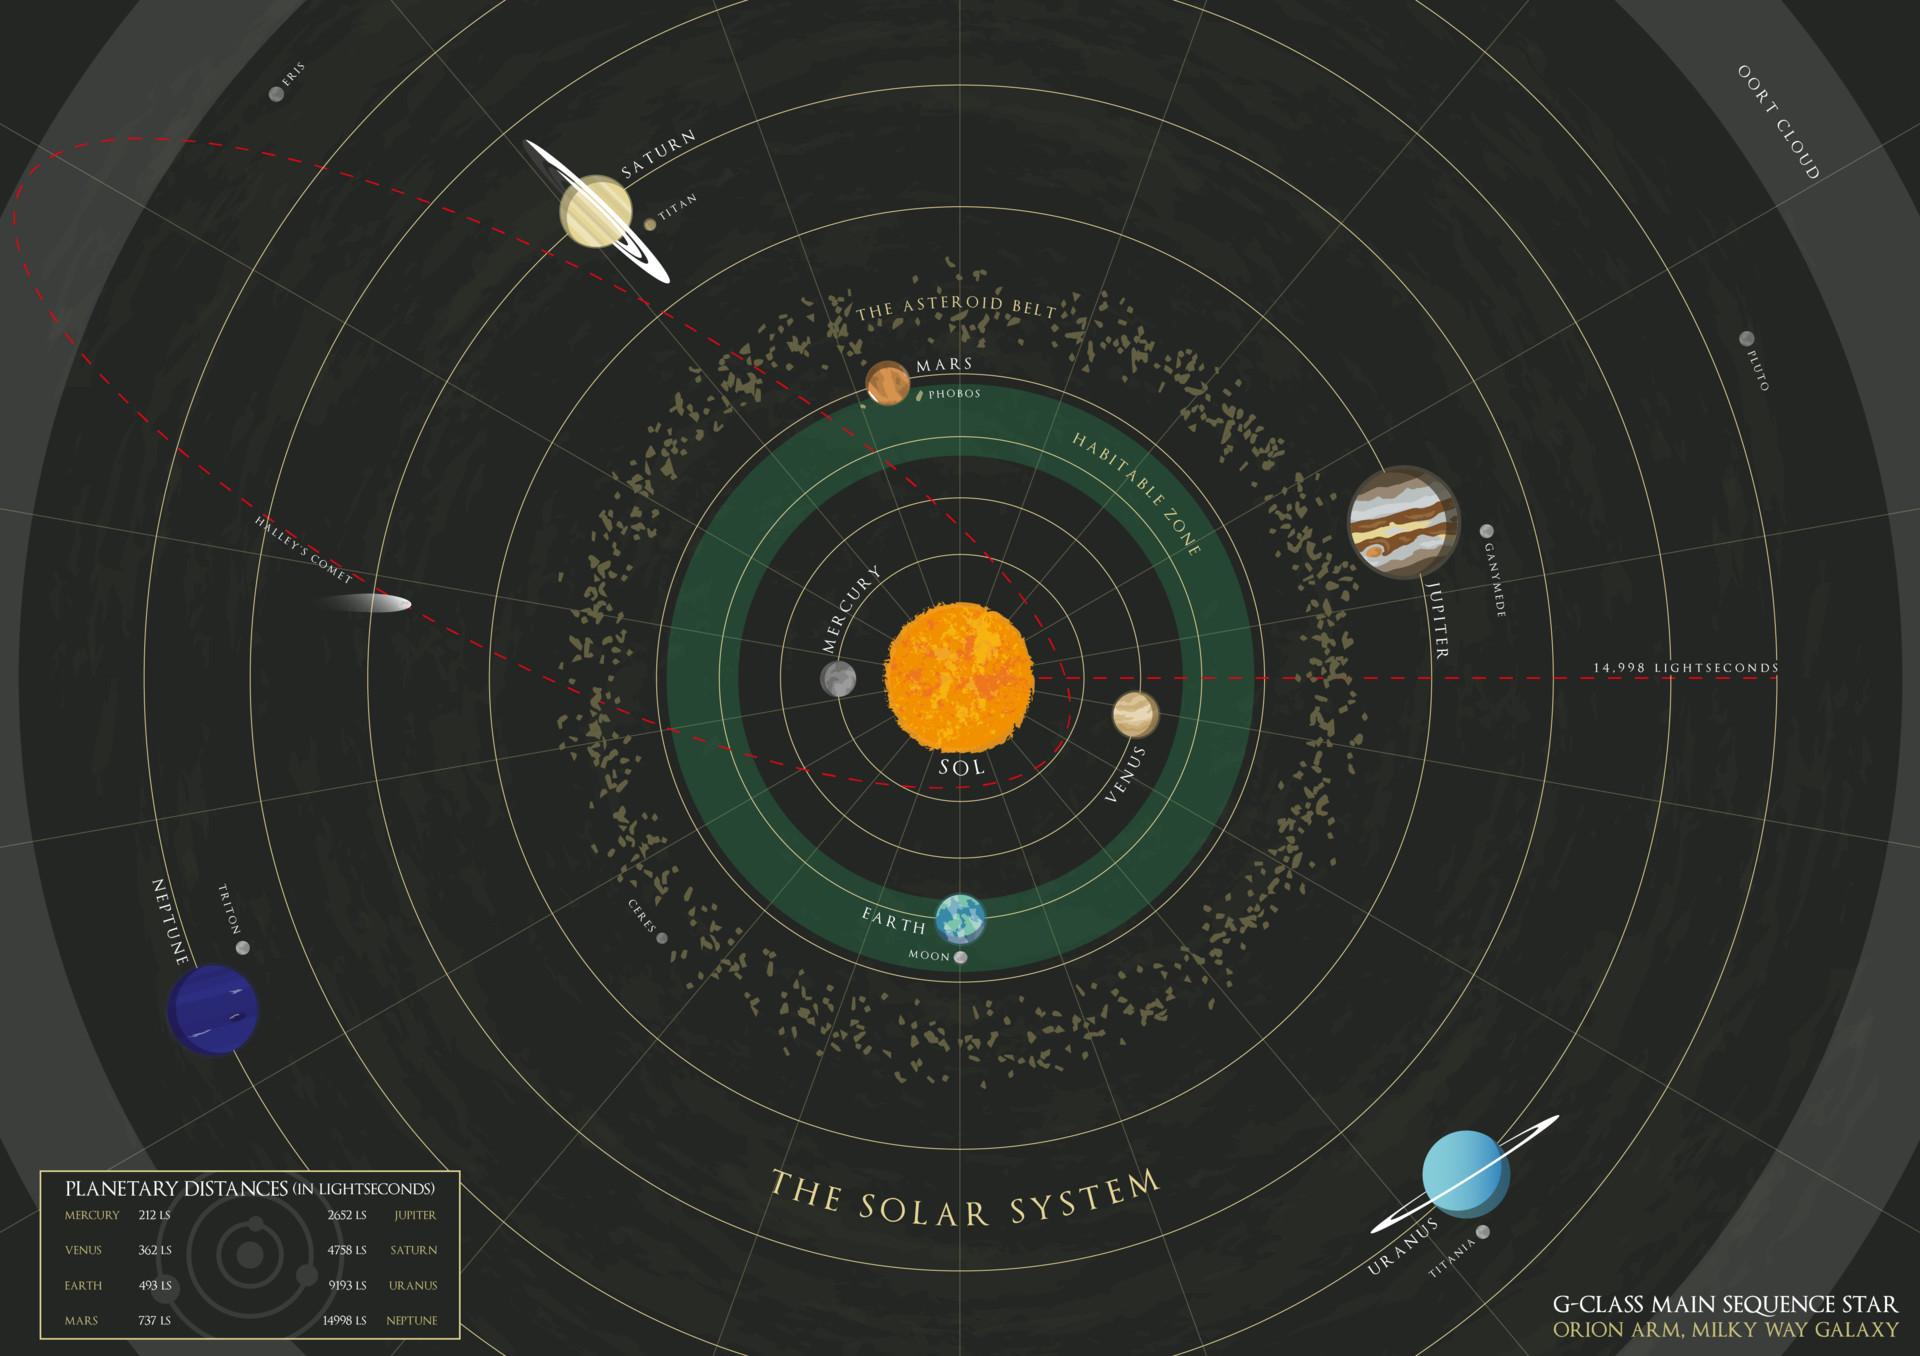 Mathew maddison solar system map m maddison 01